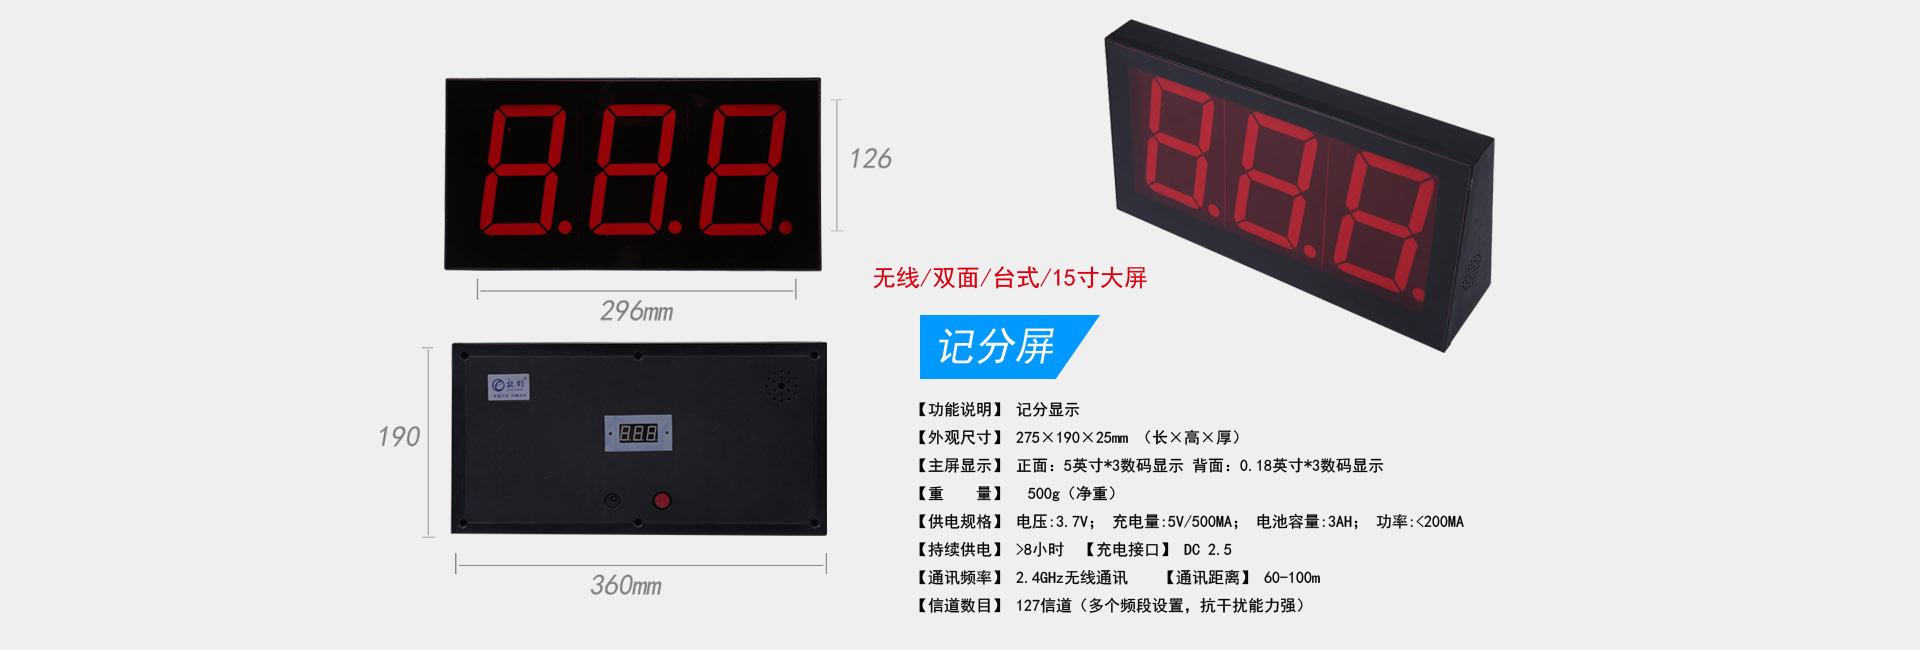 Product_jifen5.jpg